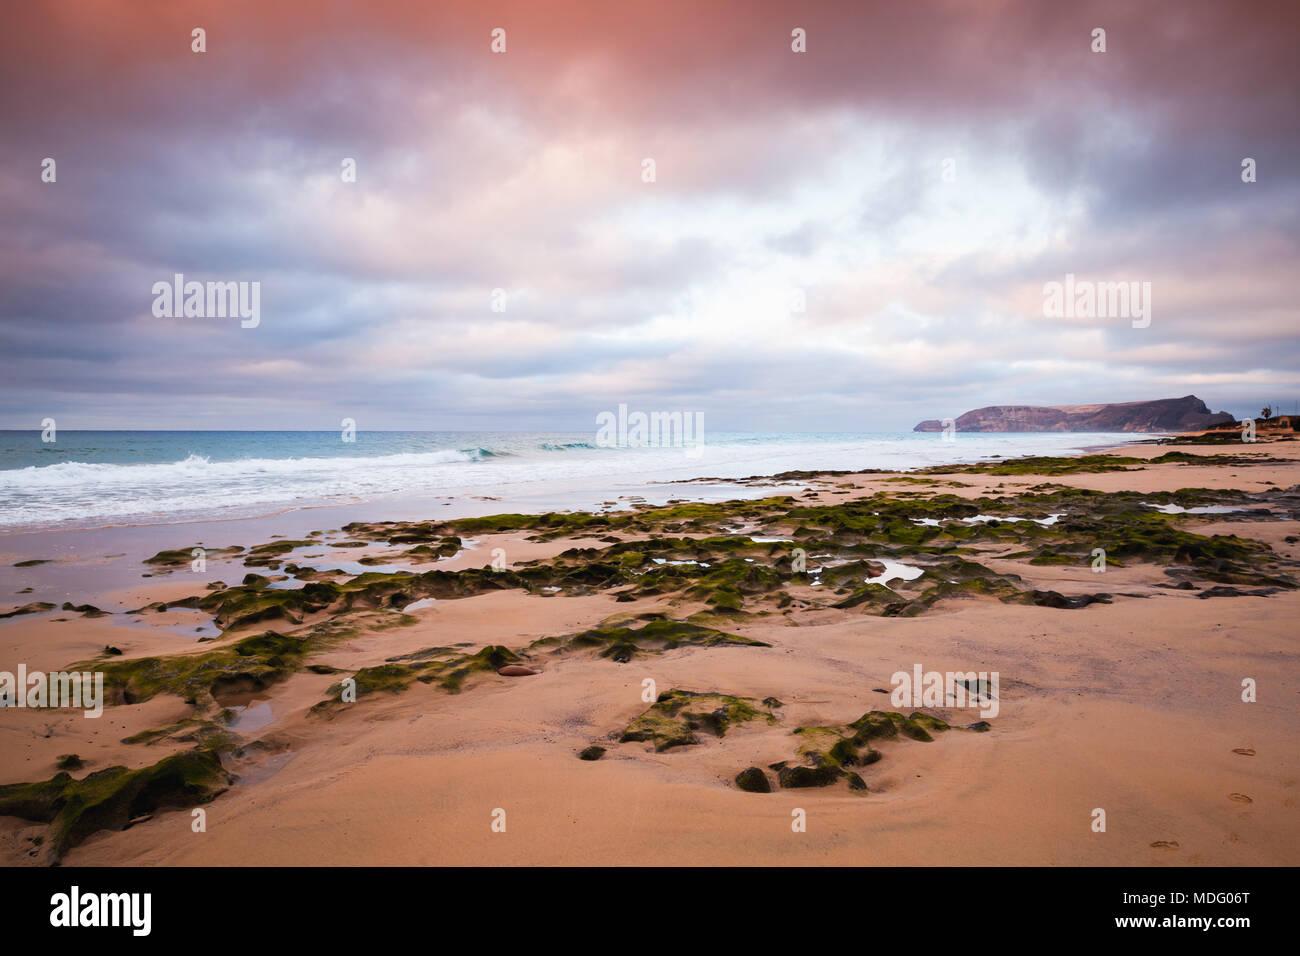 Beach of Porto Santo island, Madeira archipelago, Portugal. Wet coastal stones with seaweed - Stock Image